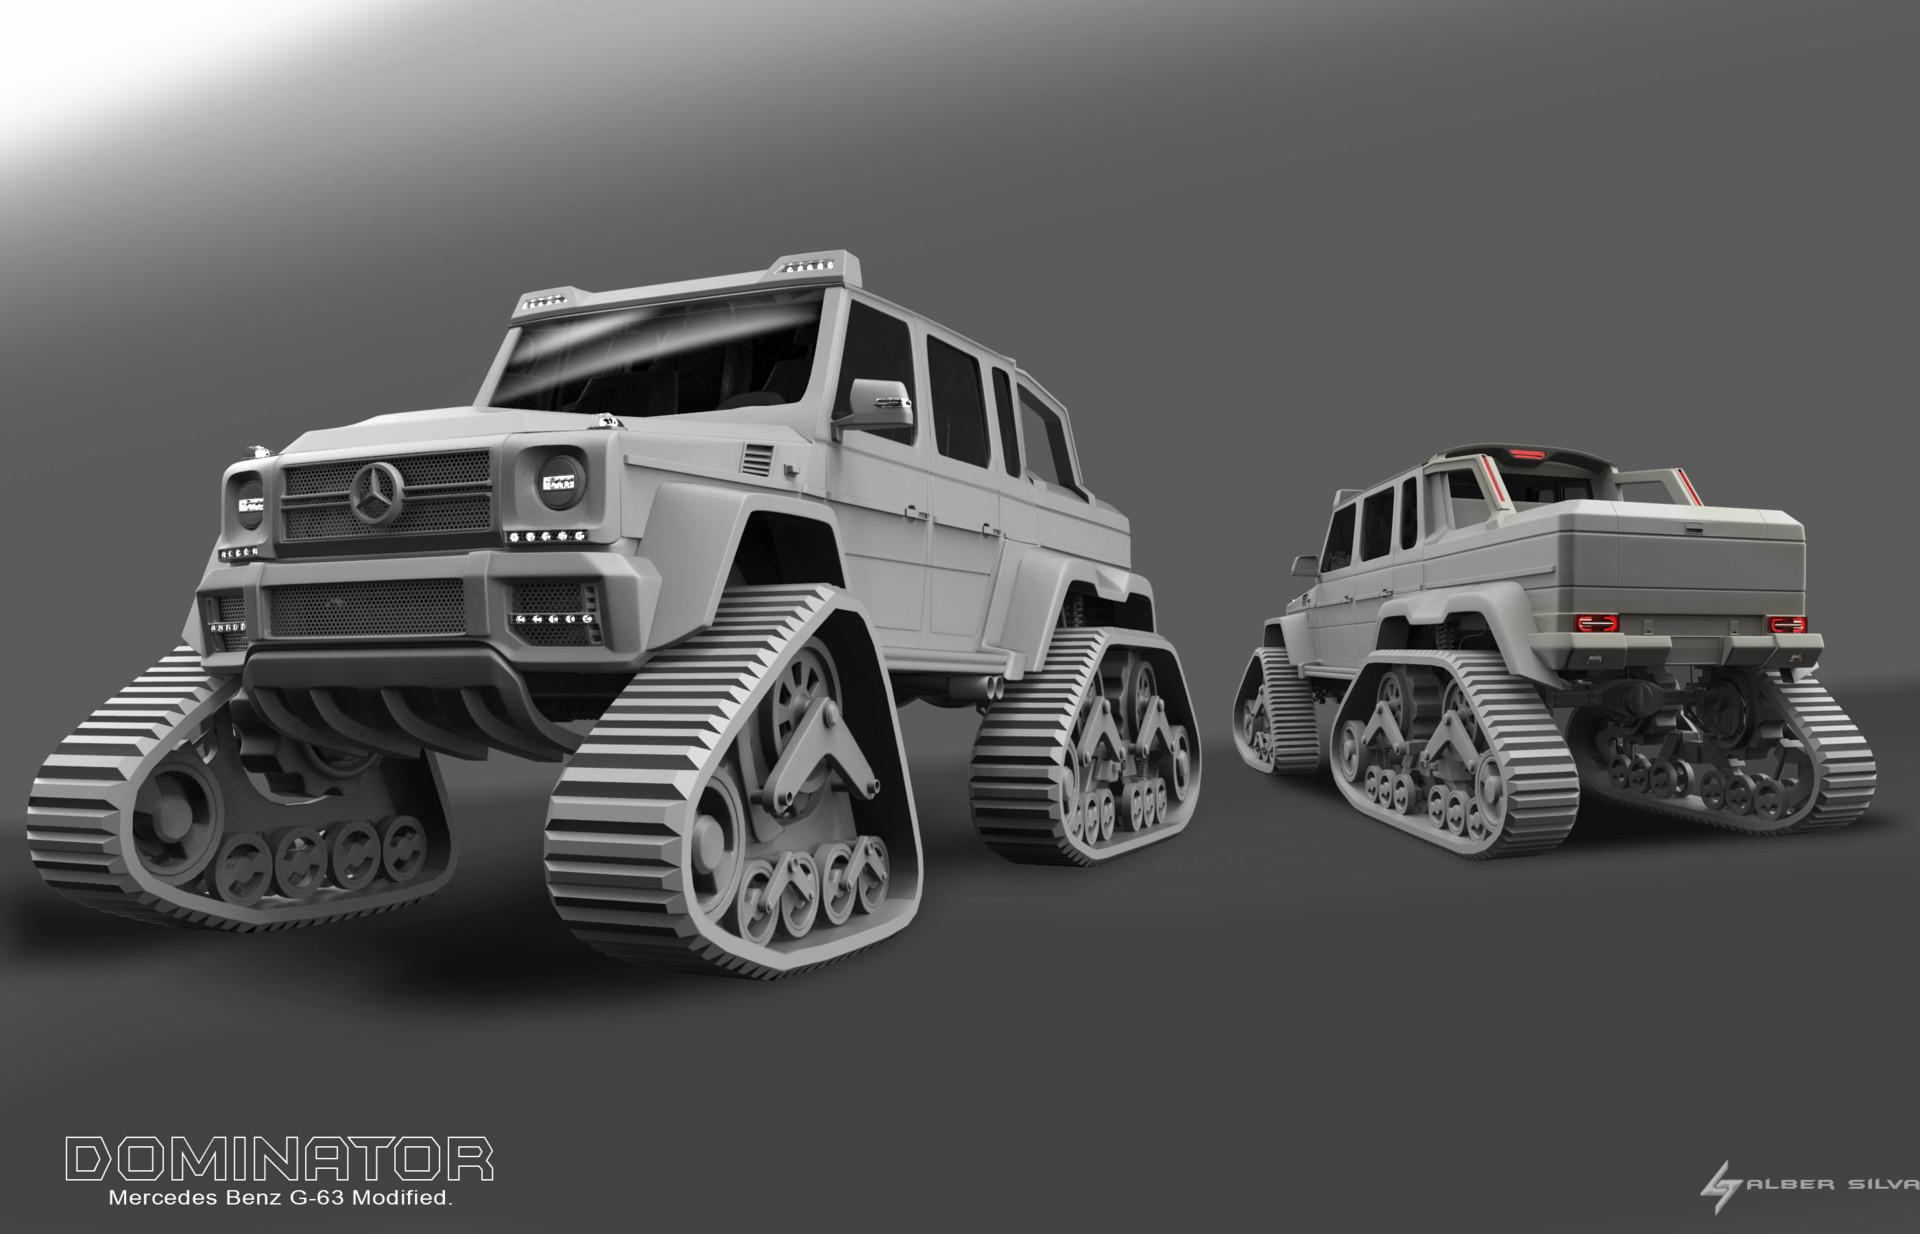 Artstation Dominator Mercedes Benz G 63 6x6 Modified Alber Silva